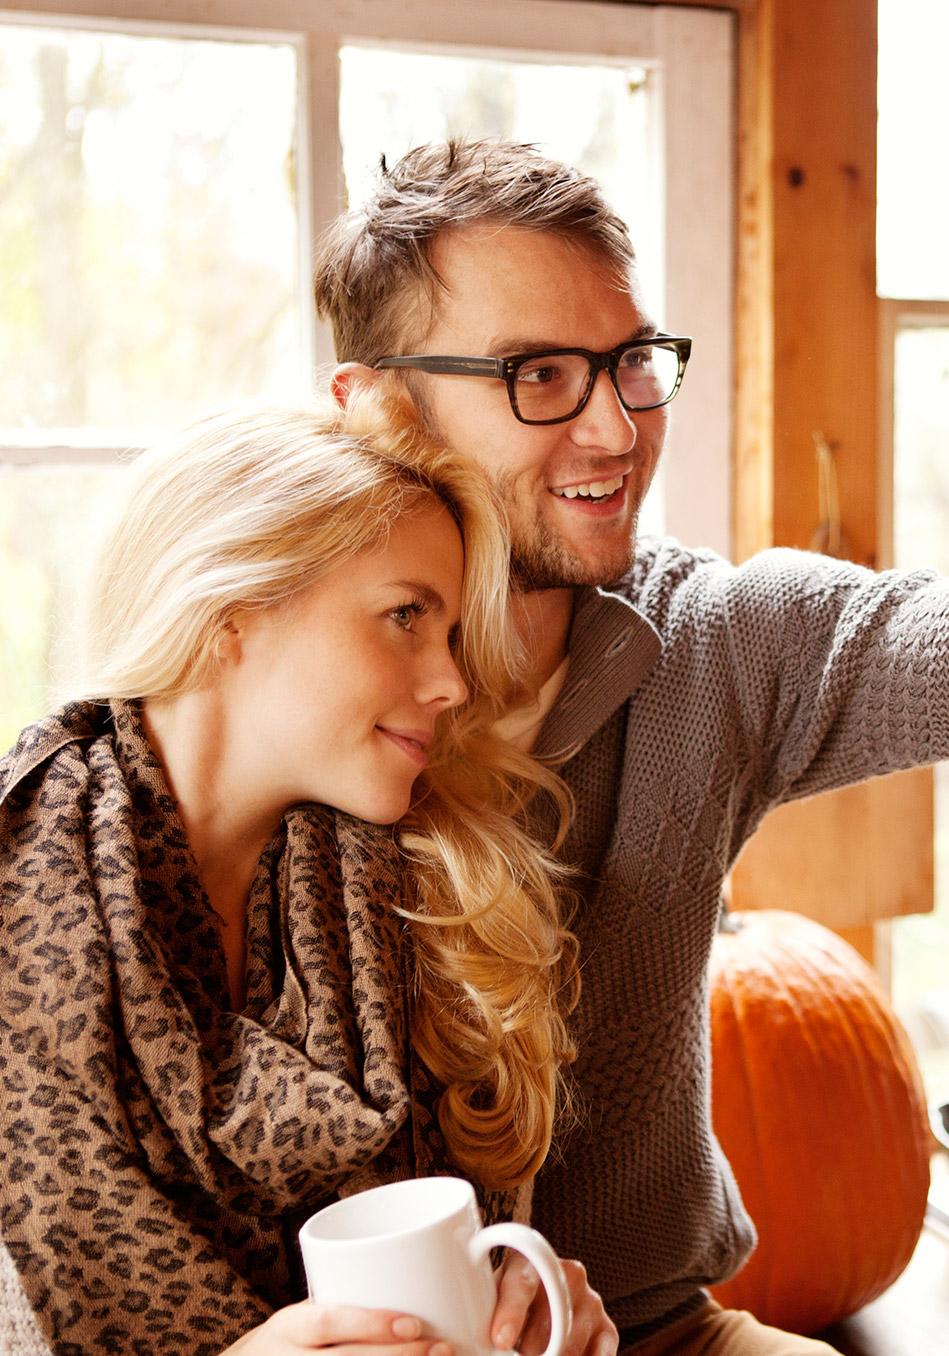 7 Secrets to Hosting an Unforgettable Get-Together